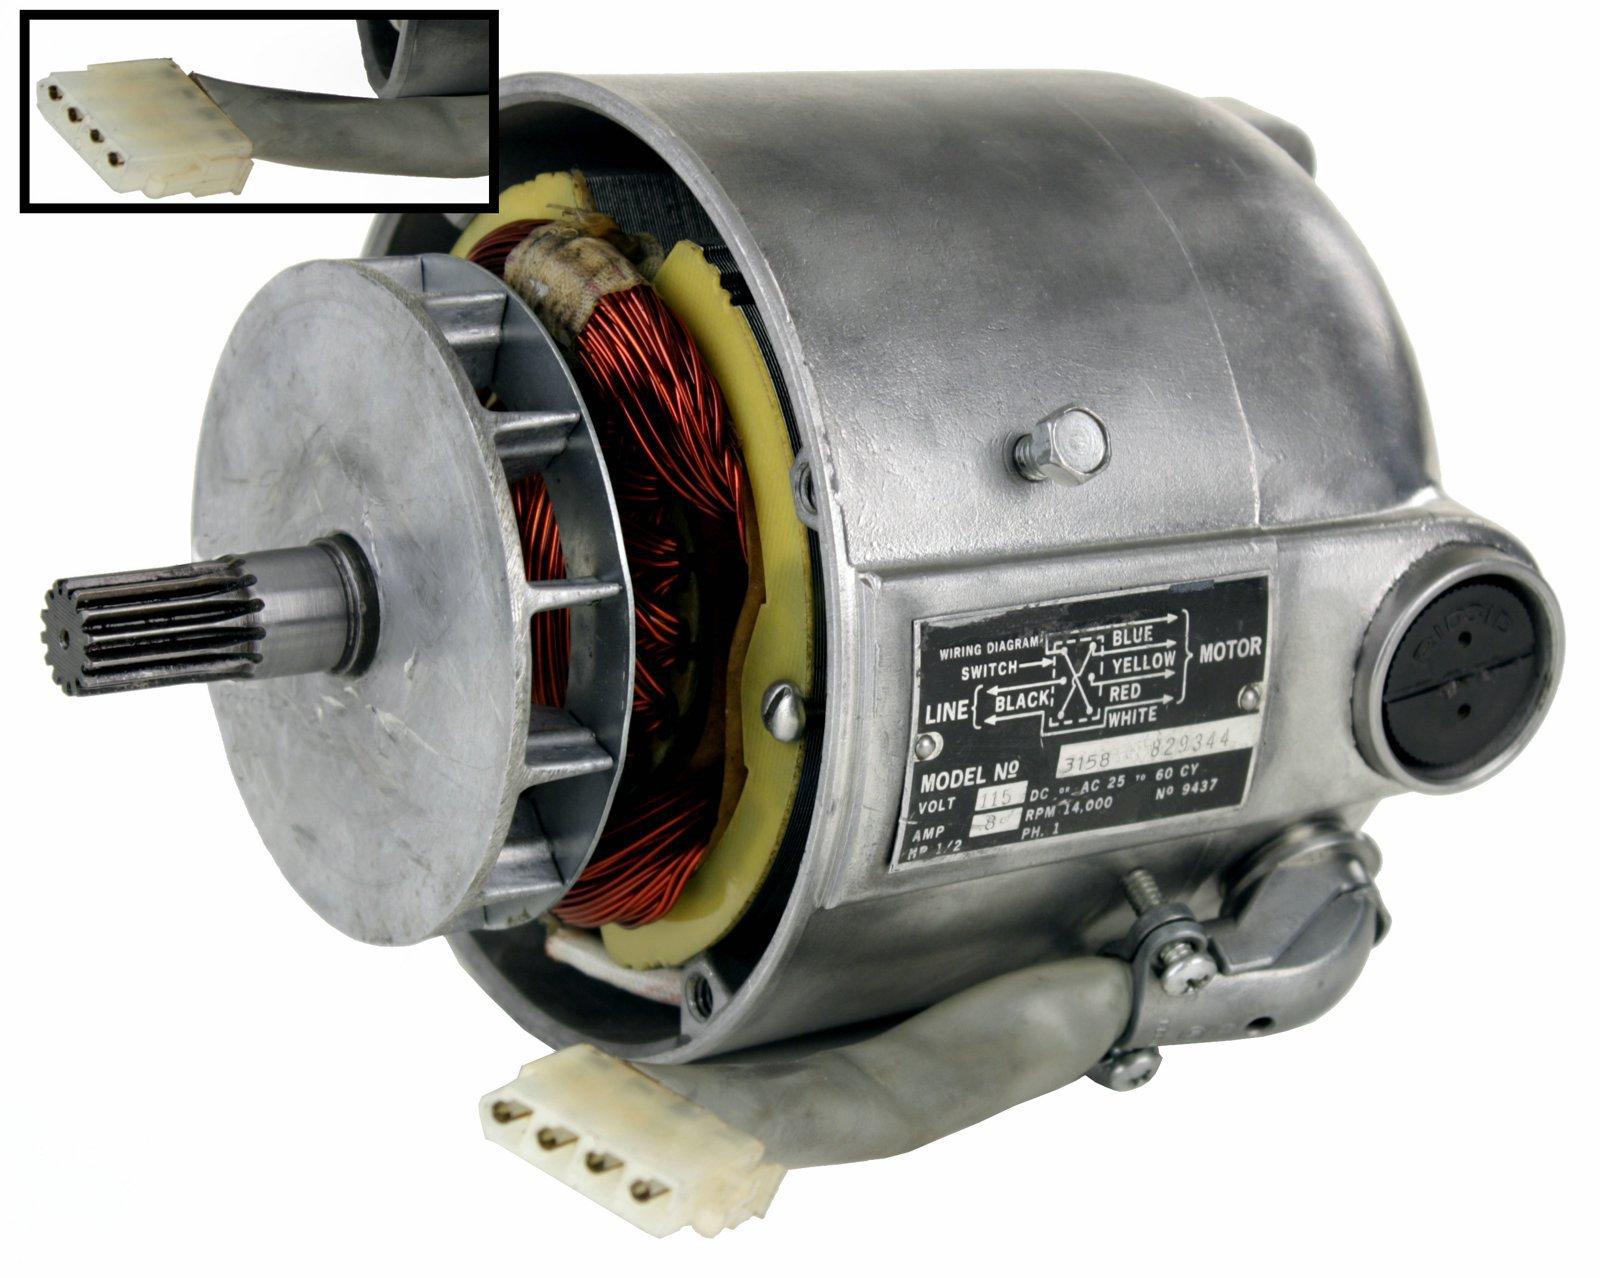 RIDGID 87740 Motor Model 3177 with White Plug (Certified Refurbished)